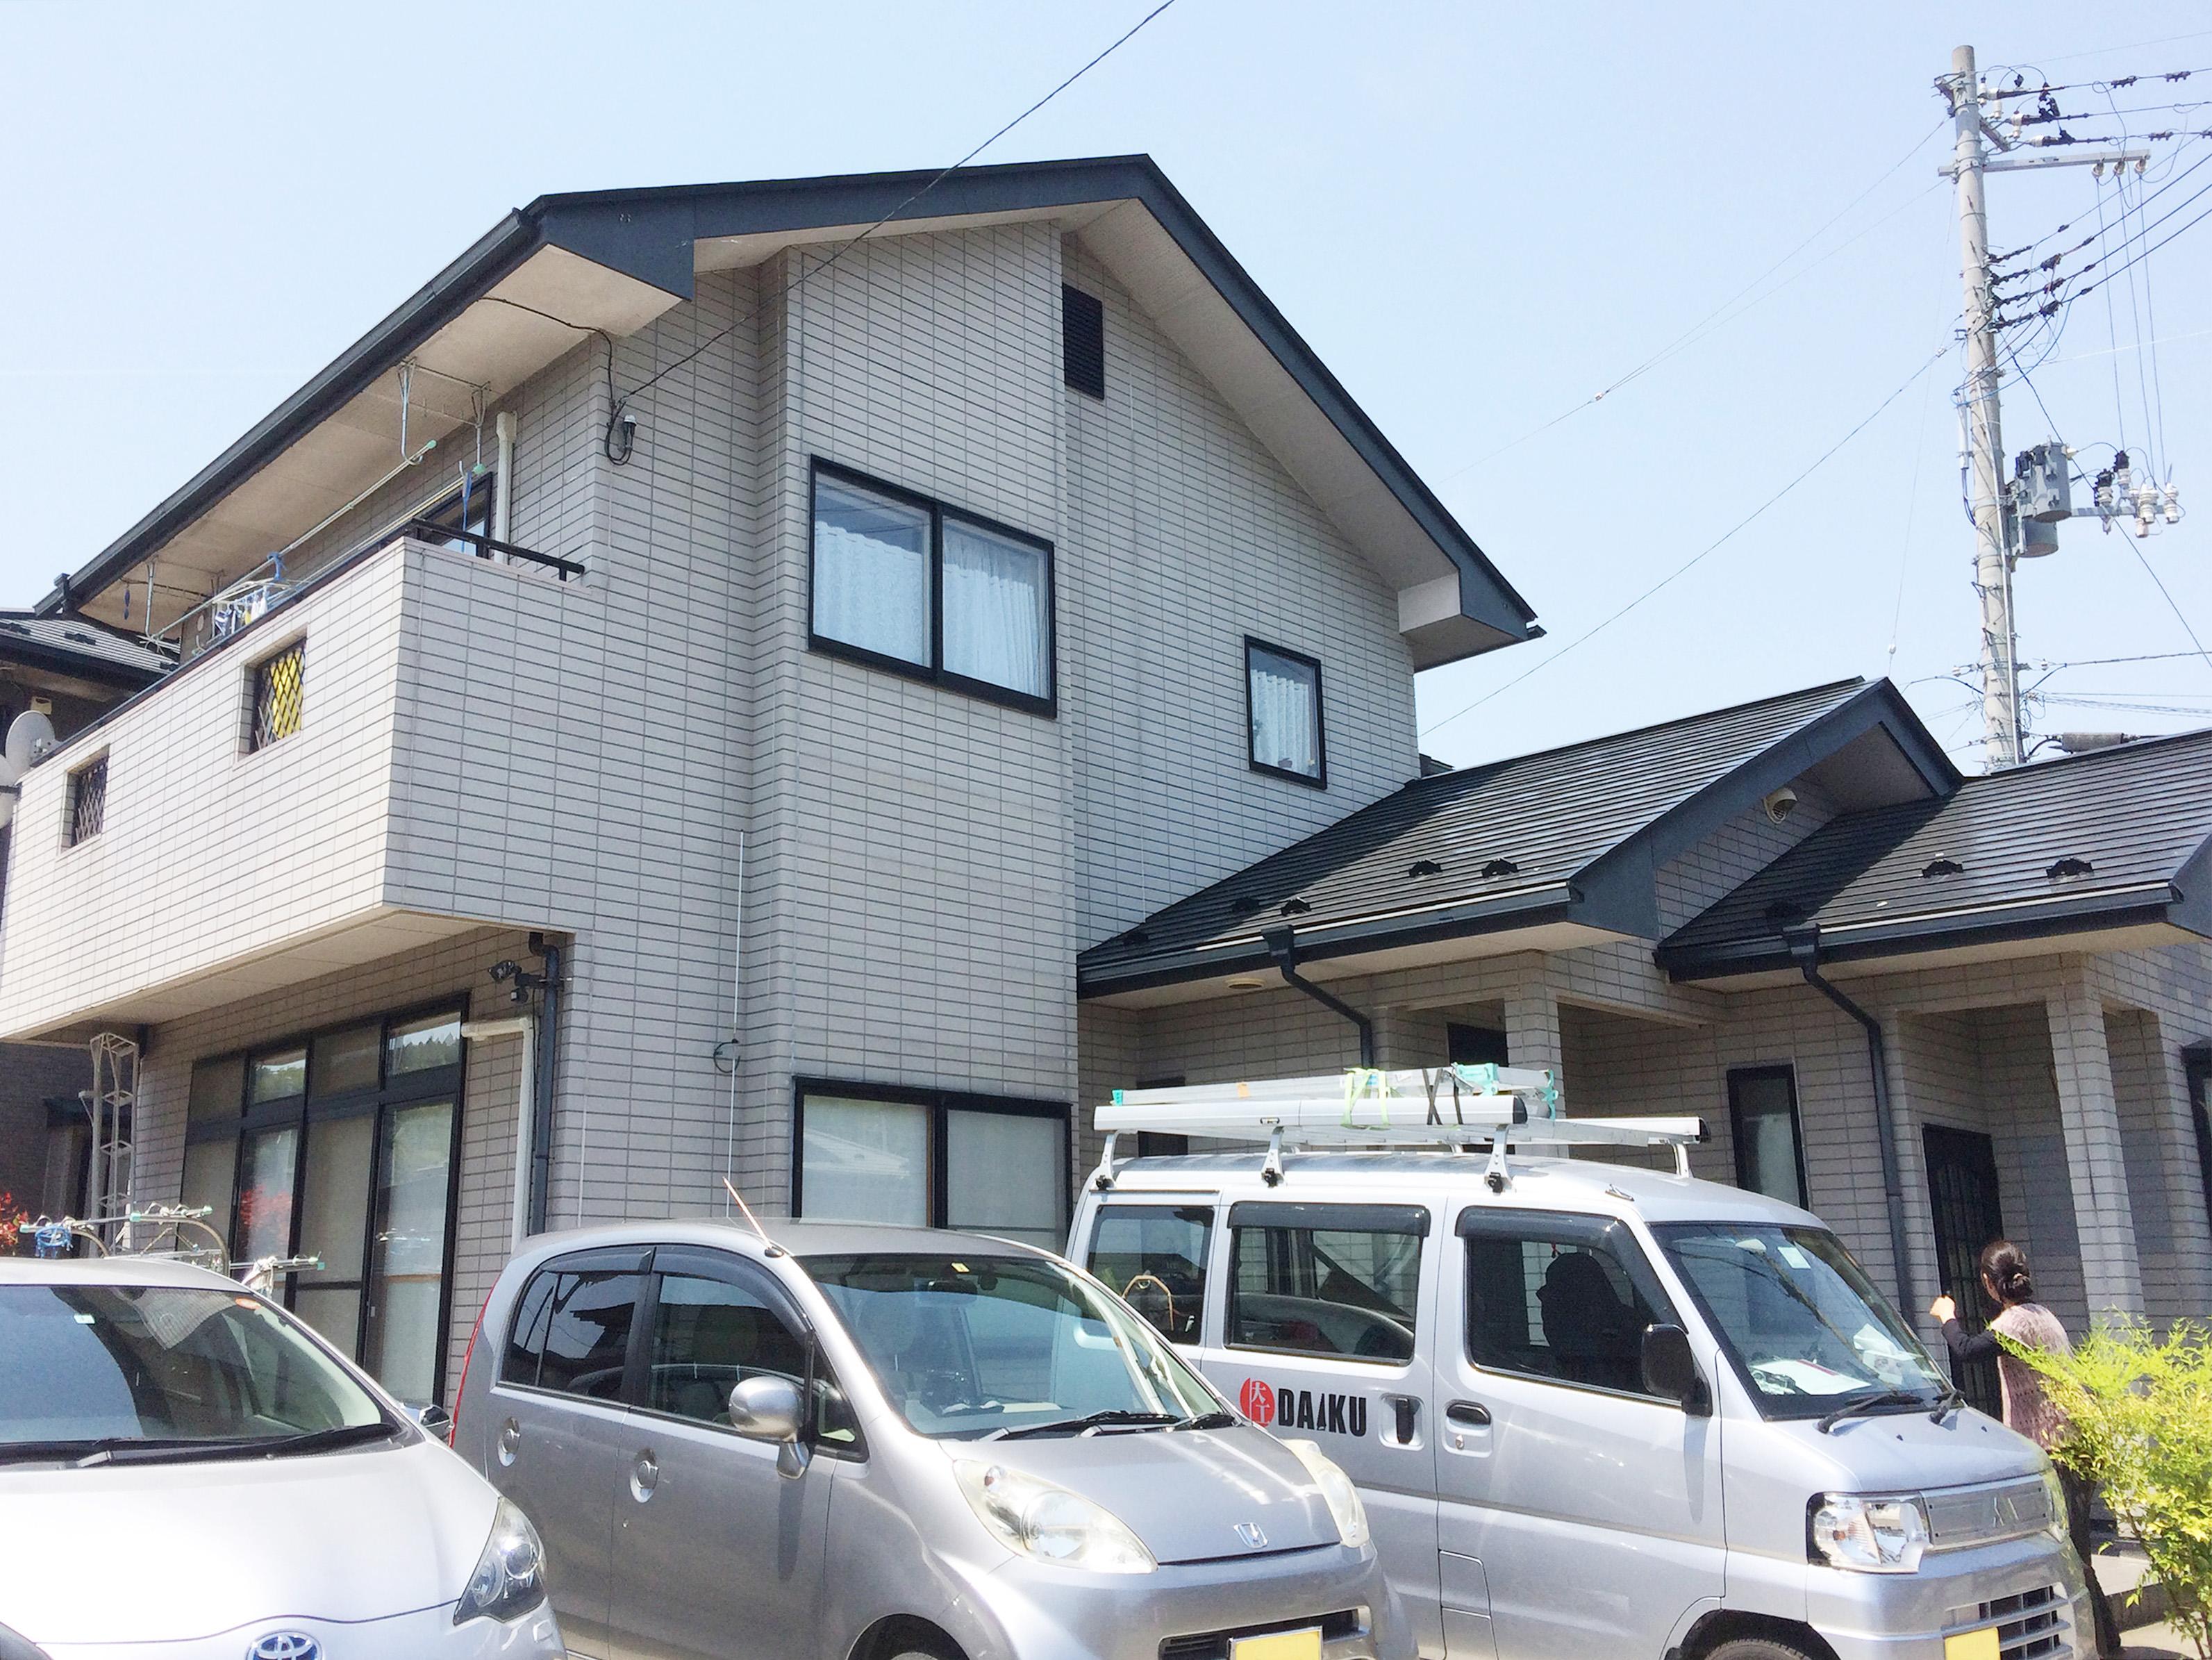 大崎市M邸 外壁塗装・外装リフォーム 120万円/工期14日間 施工前